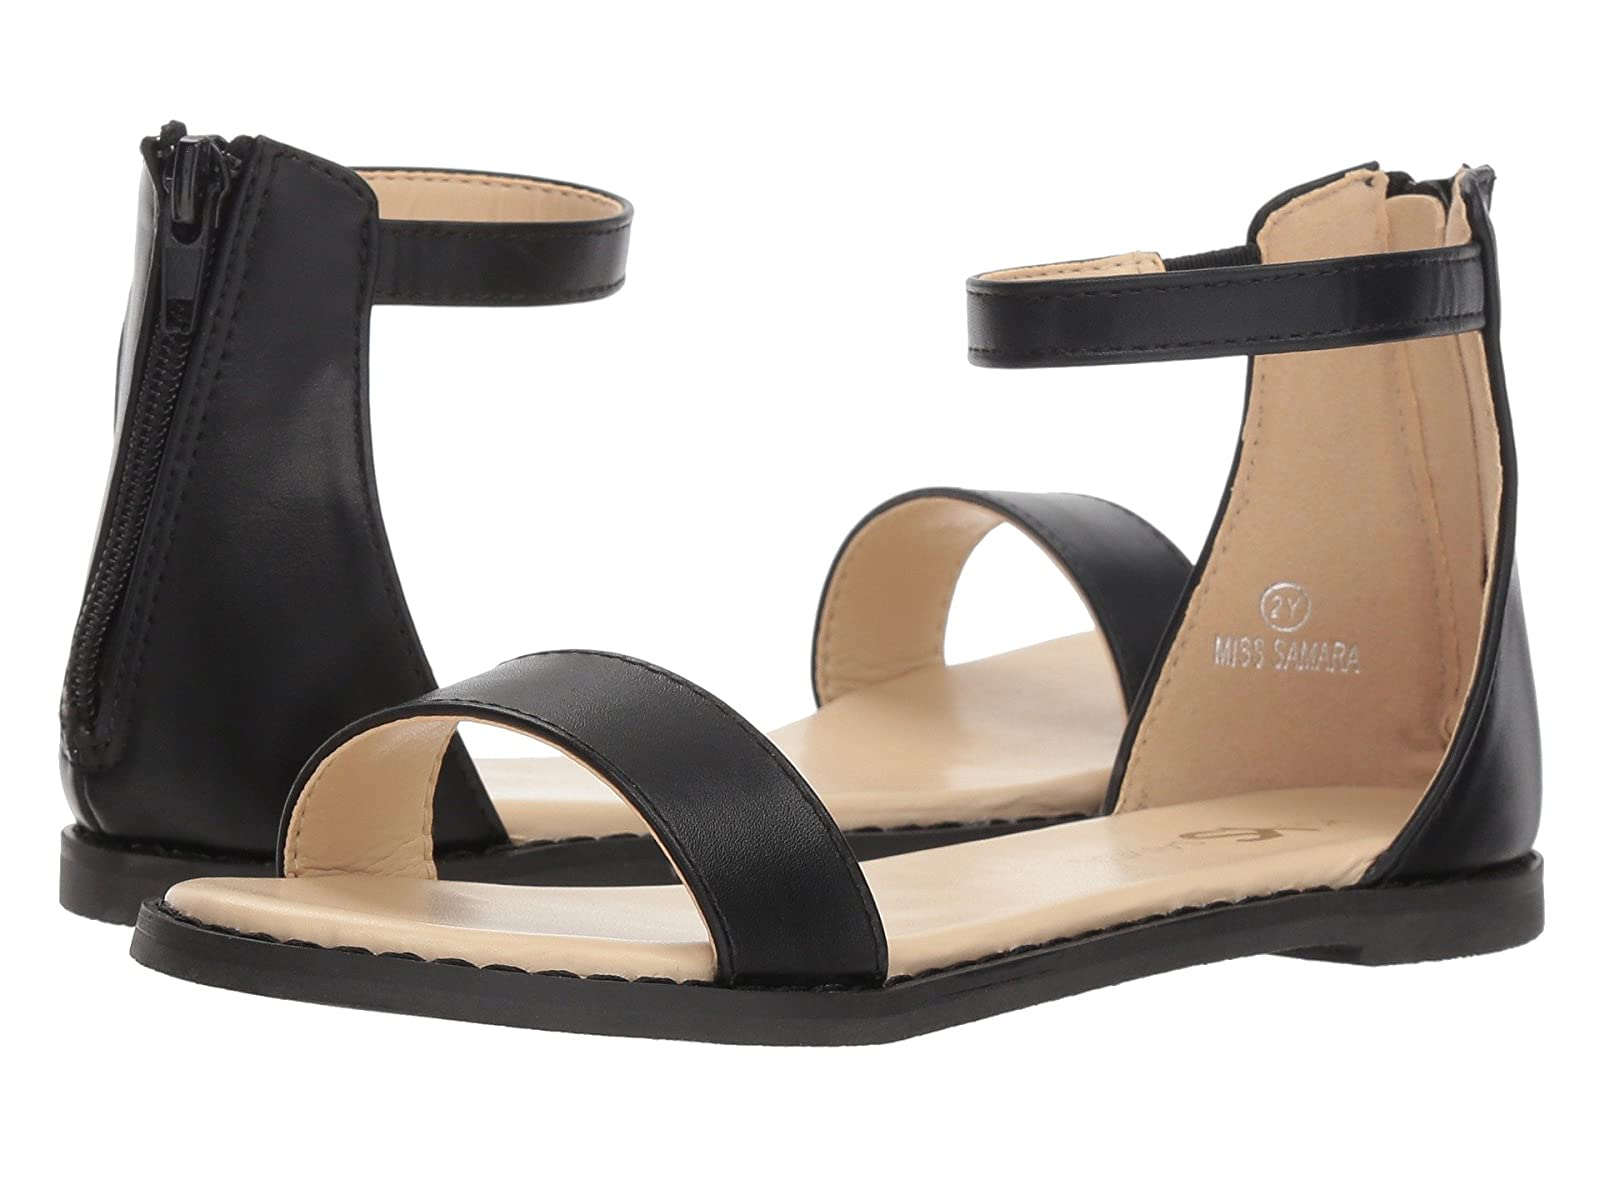 Yosi Samra Kids Miss Cambelle (Toddler/Little Kid/Big Kid)Atmospheric grades have affordable shoes